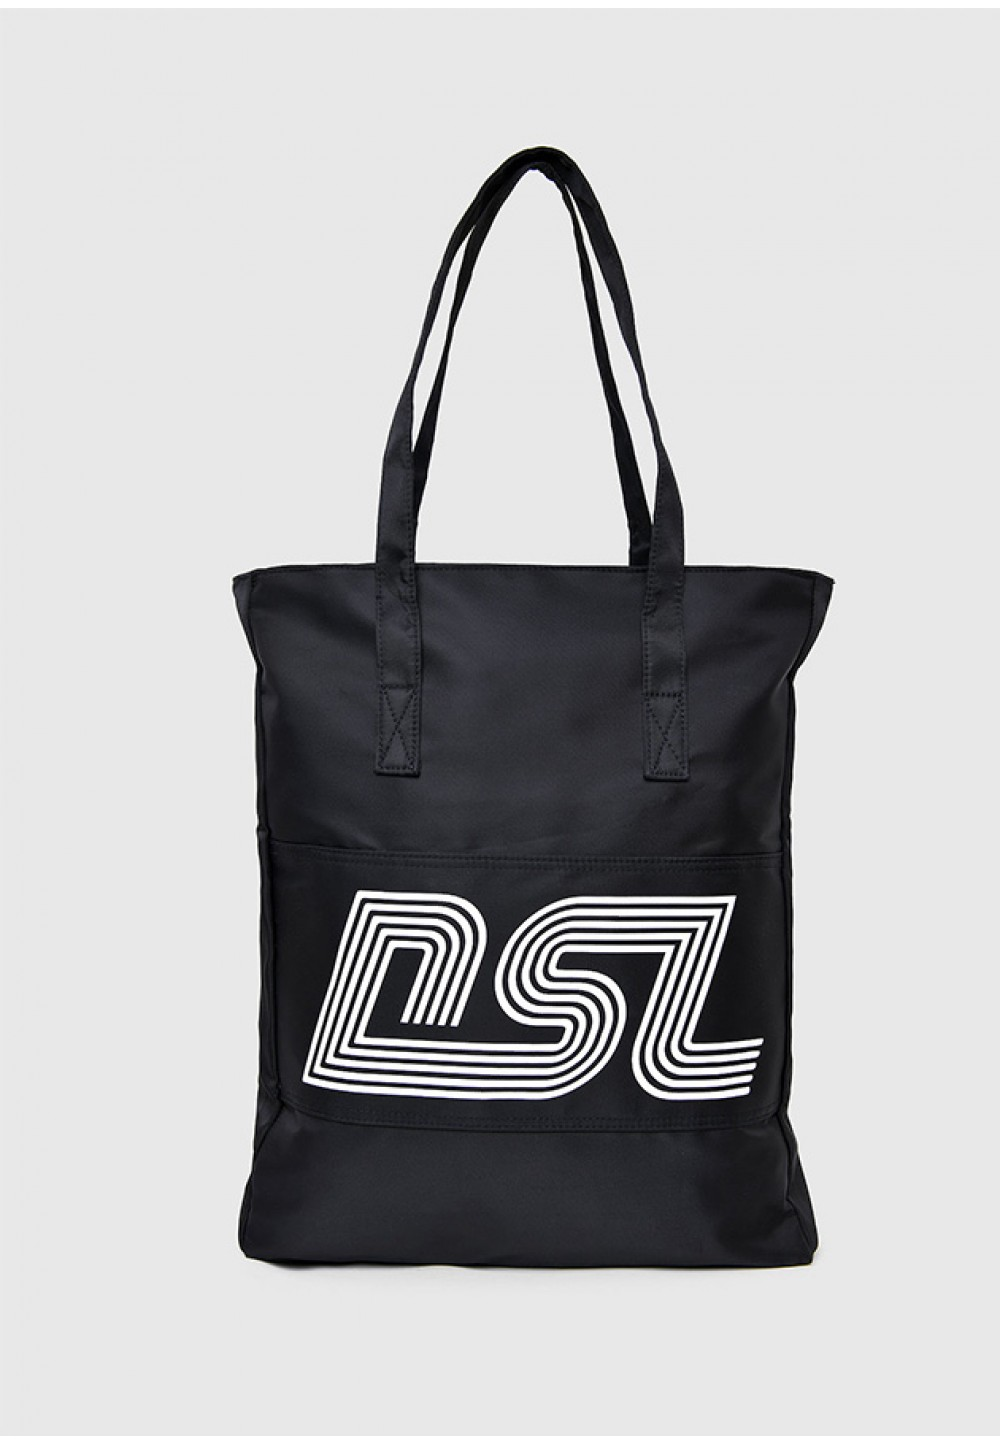 Пляжная сумка-тоут с логотипом